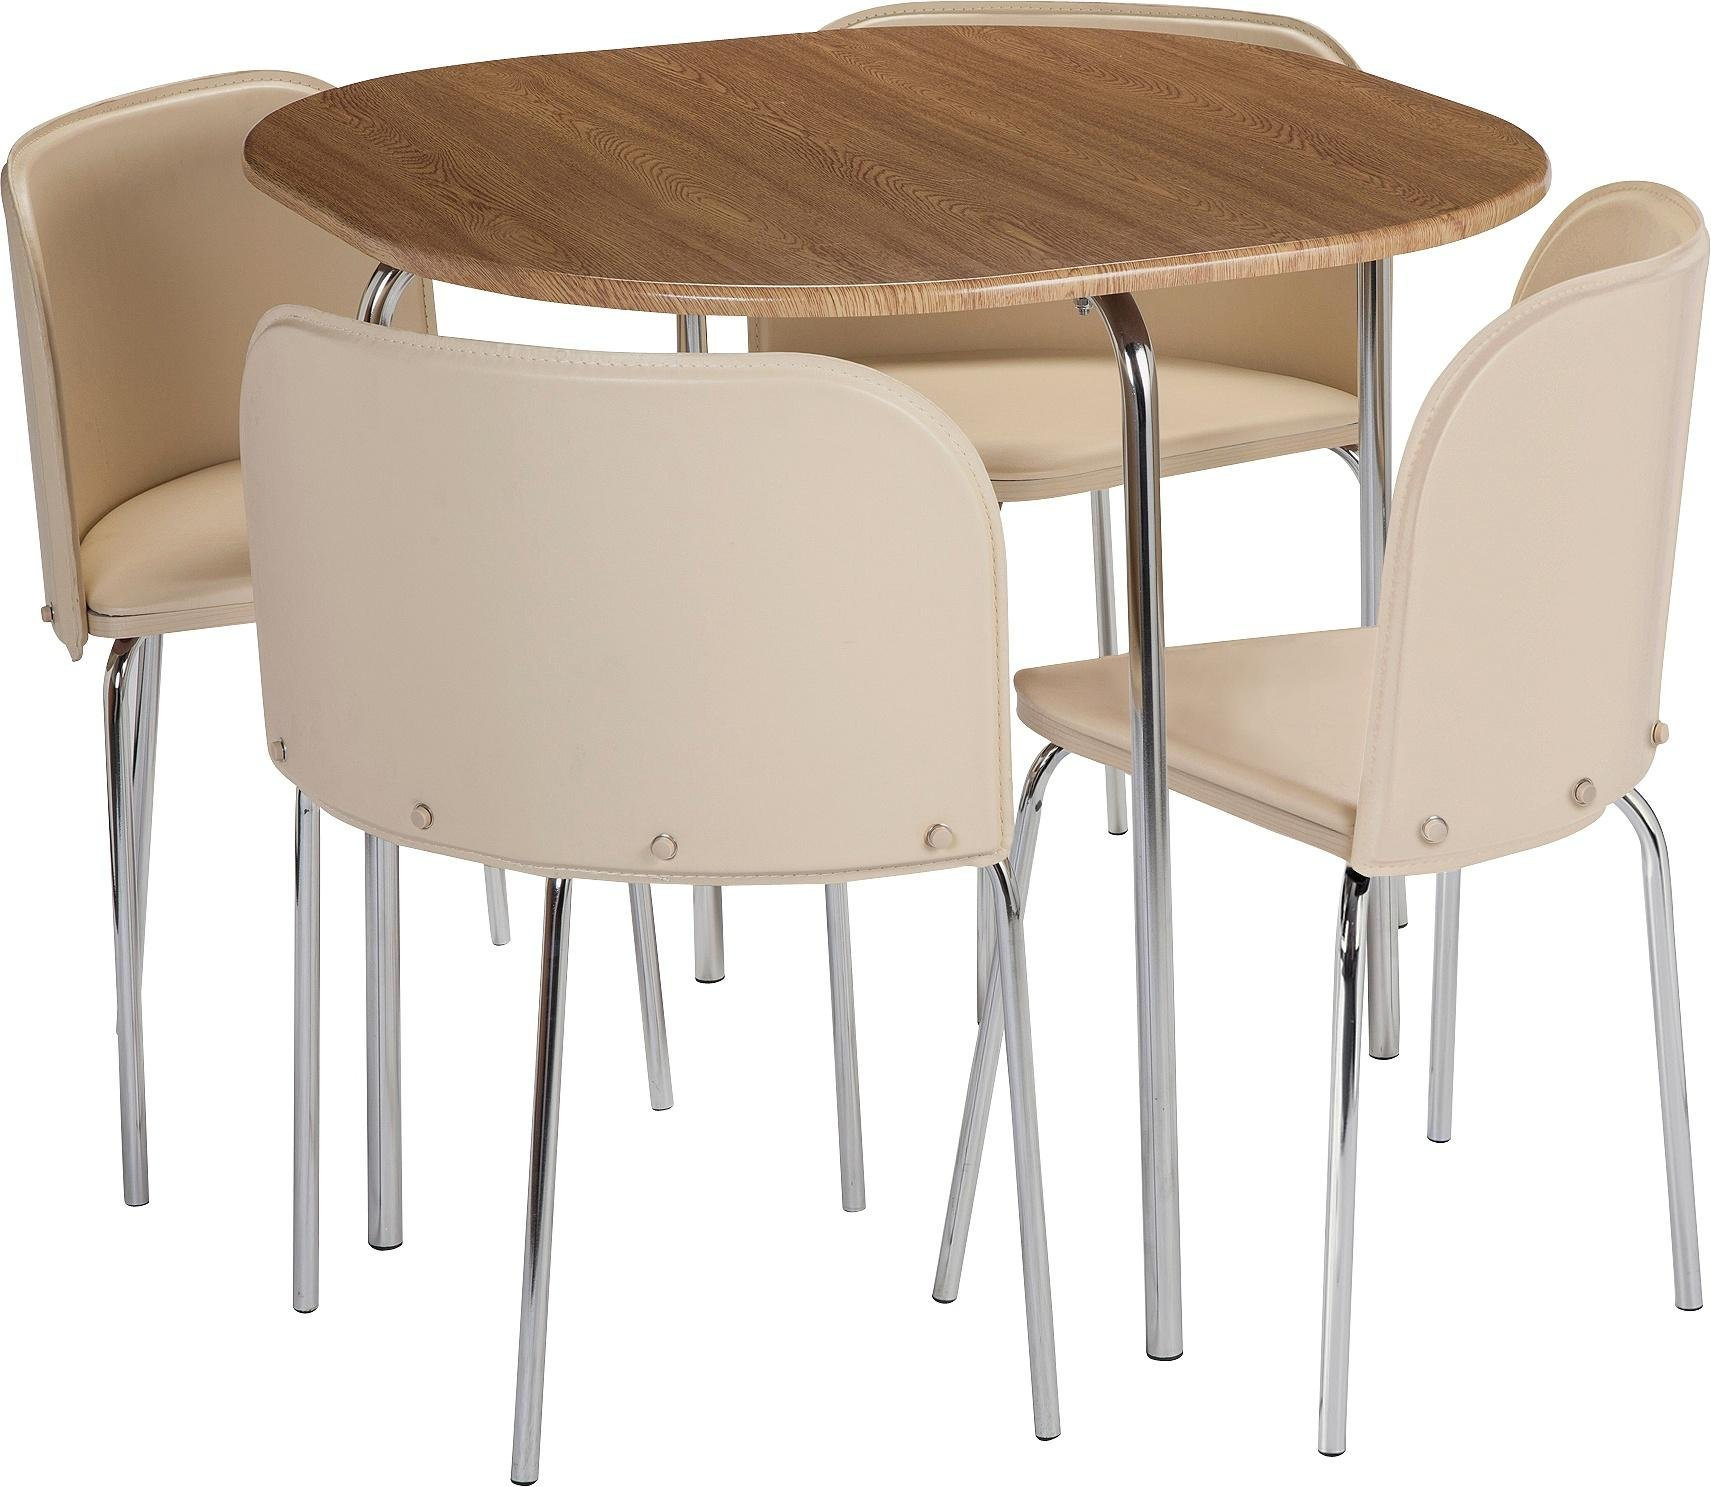 Buy Hygena Amparo Oak Effect Dining Table and 4 Chairs  : 6006541RZ001AUC1662284Webampw570amph513 from www.argos.co.uk size 570 x 513 jpeg 31kB